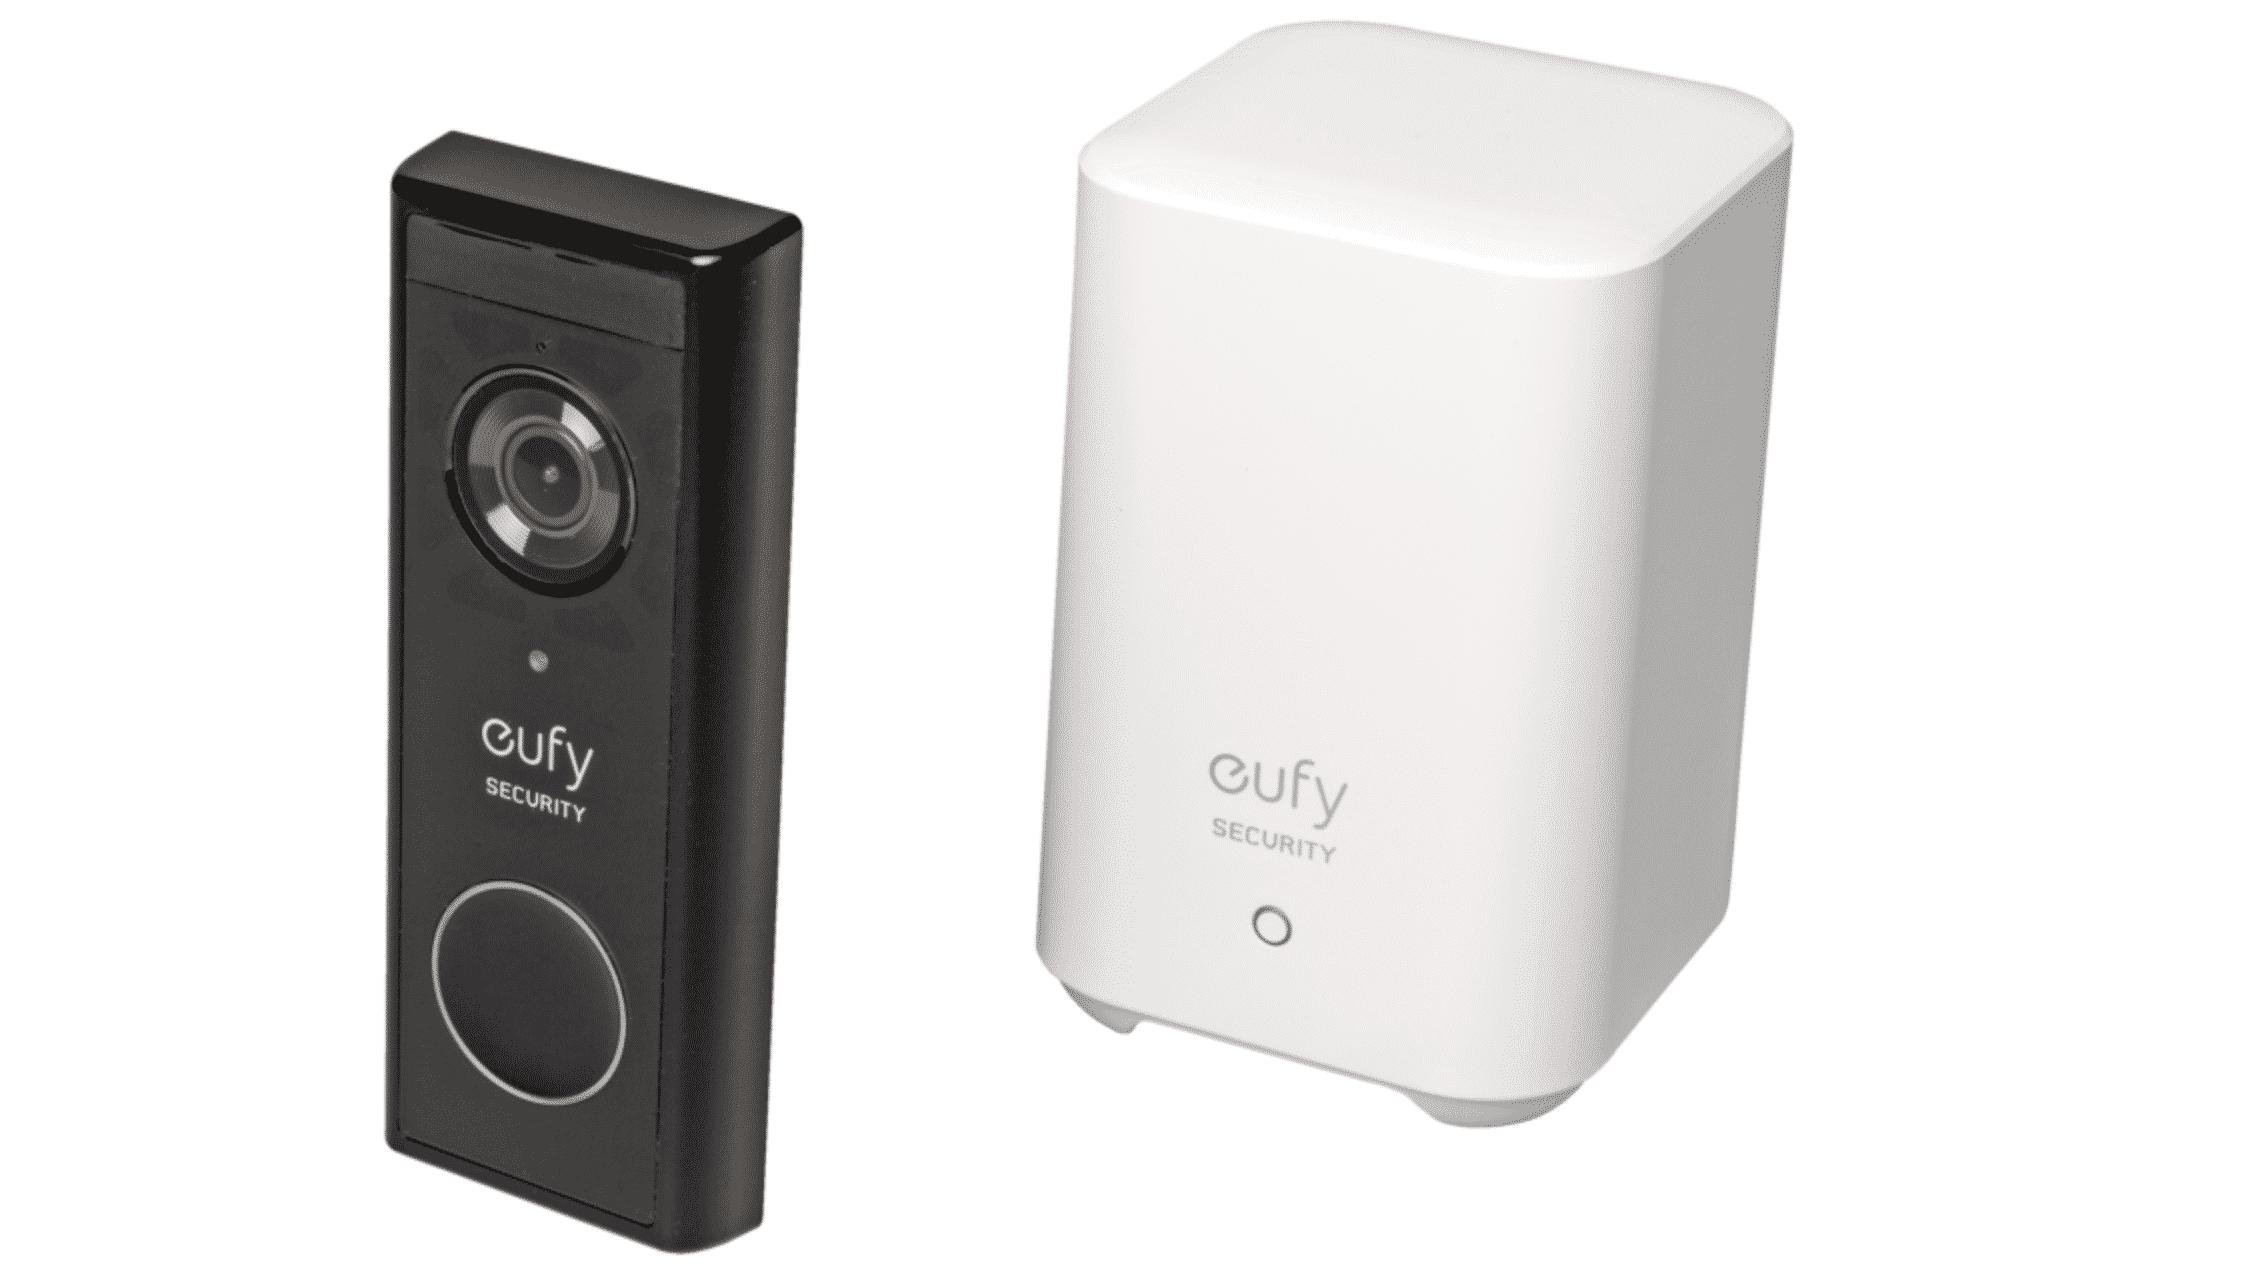 Eufy 2K Videotürklingel